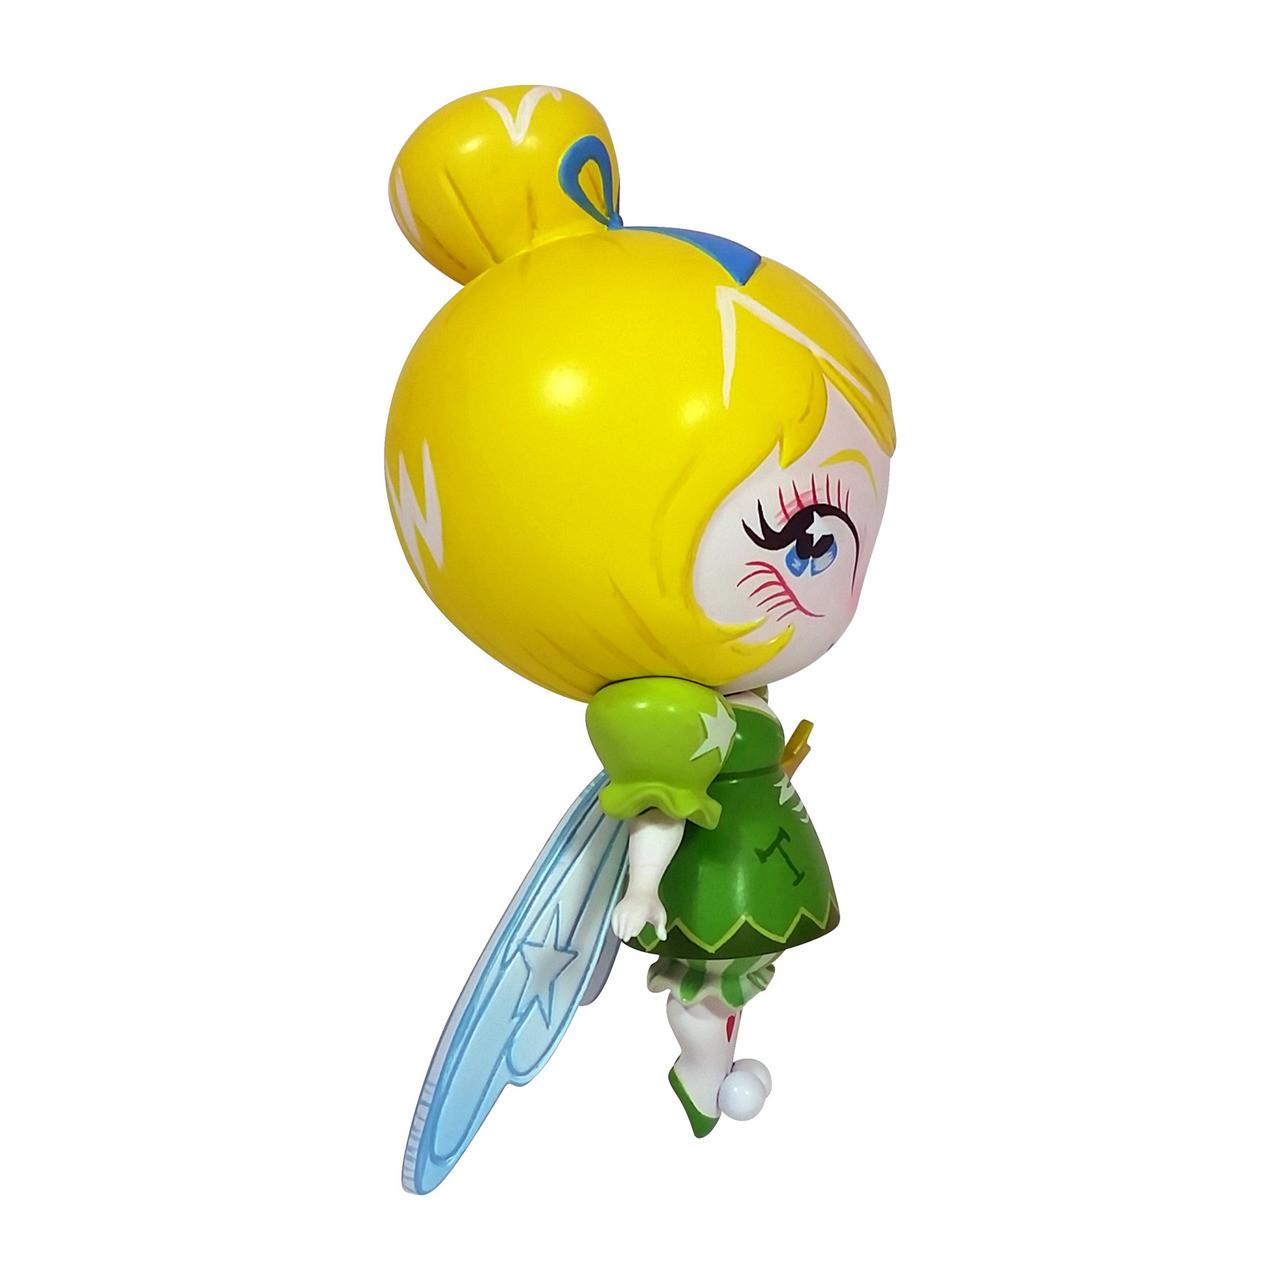 Disney Showcase The World of Miss Mindy Peter Pan Tinkerbell Vinyl Figure New